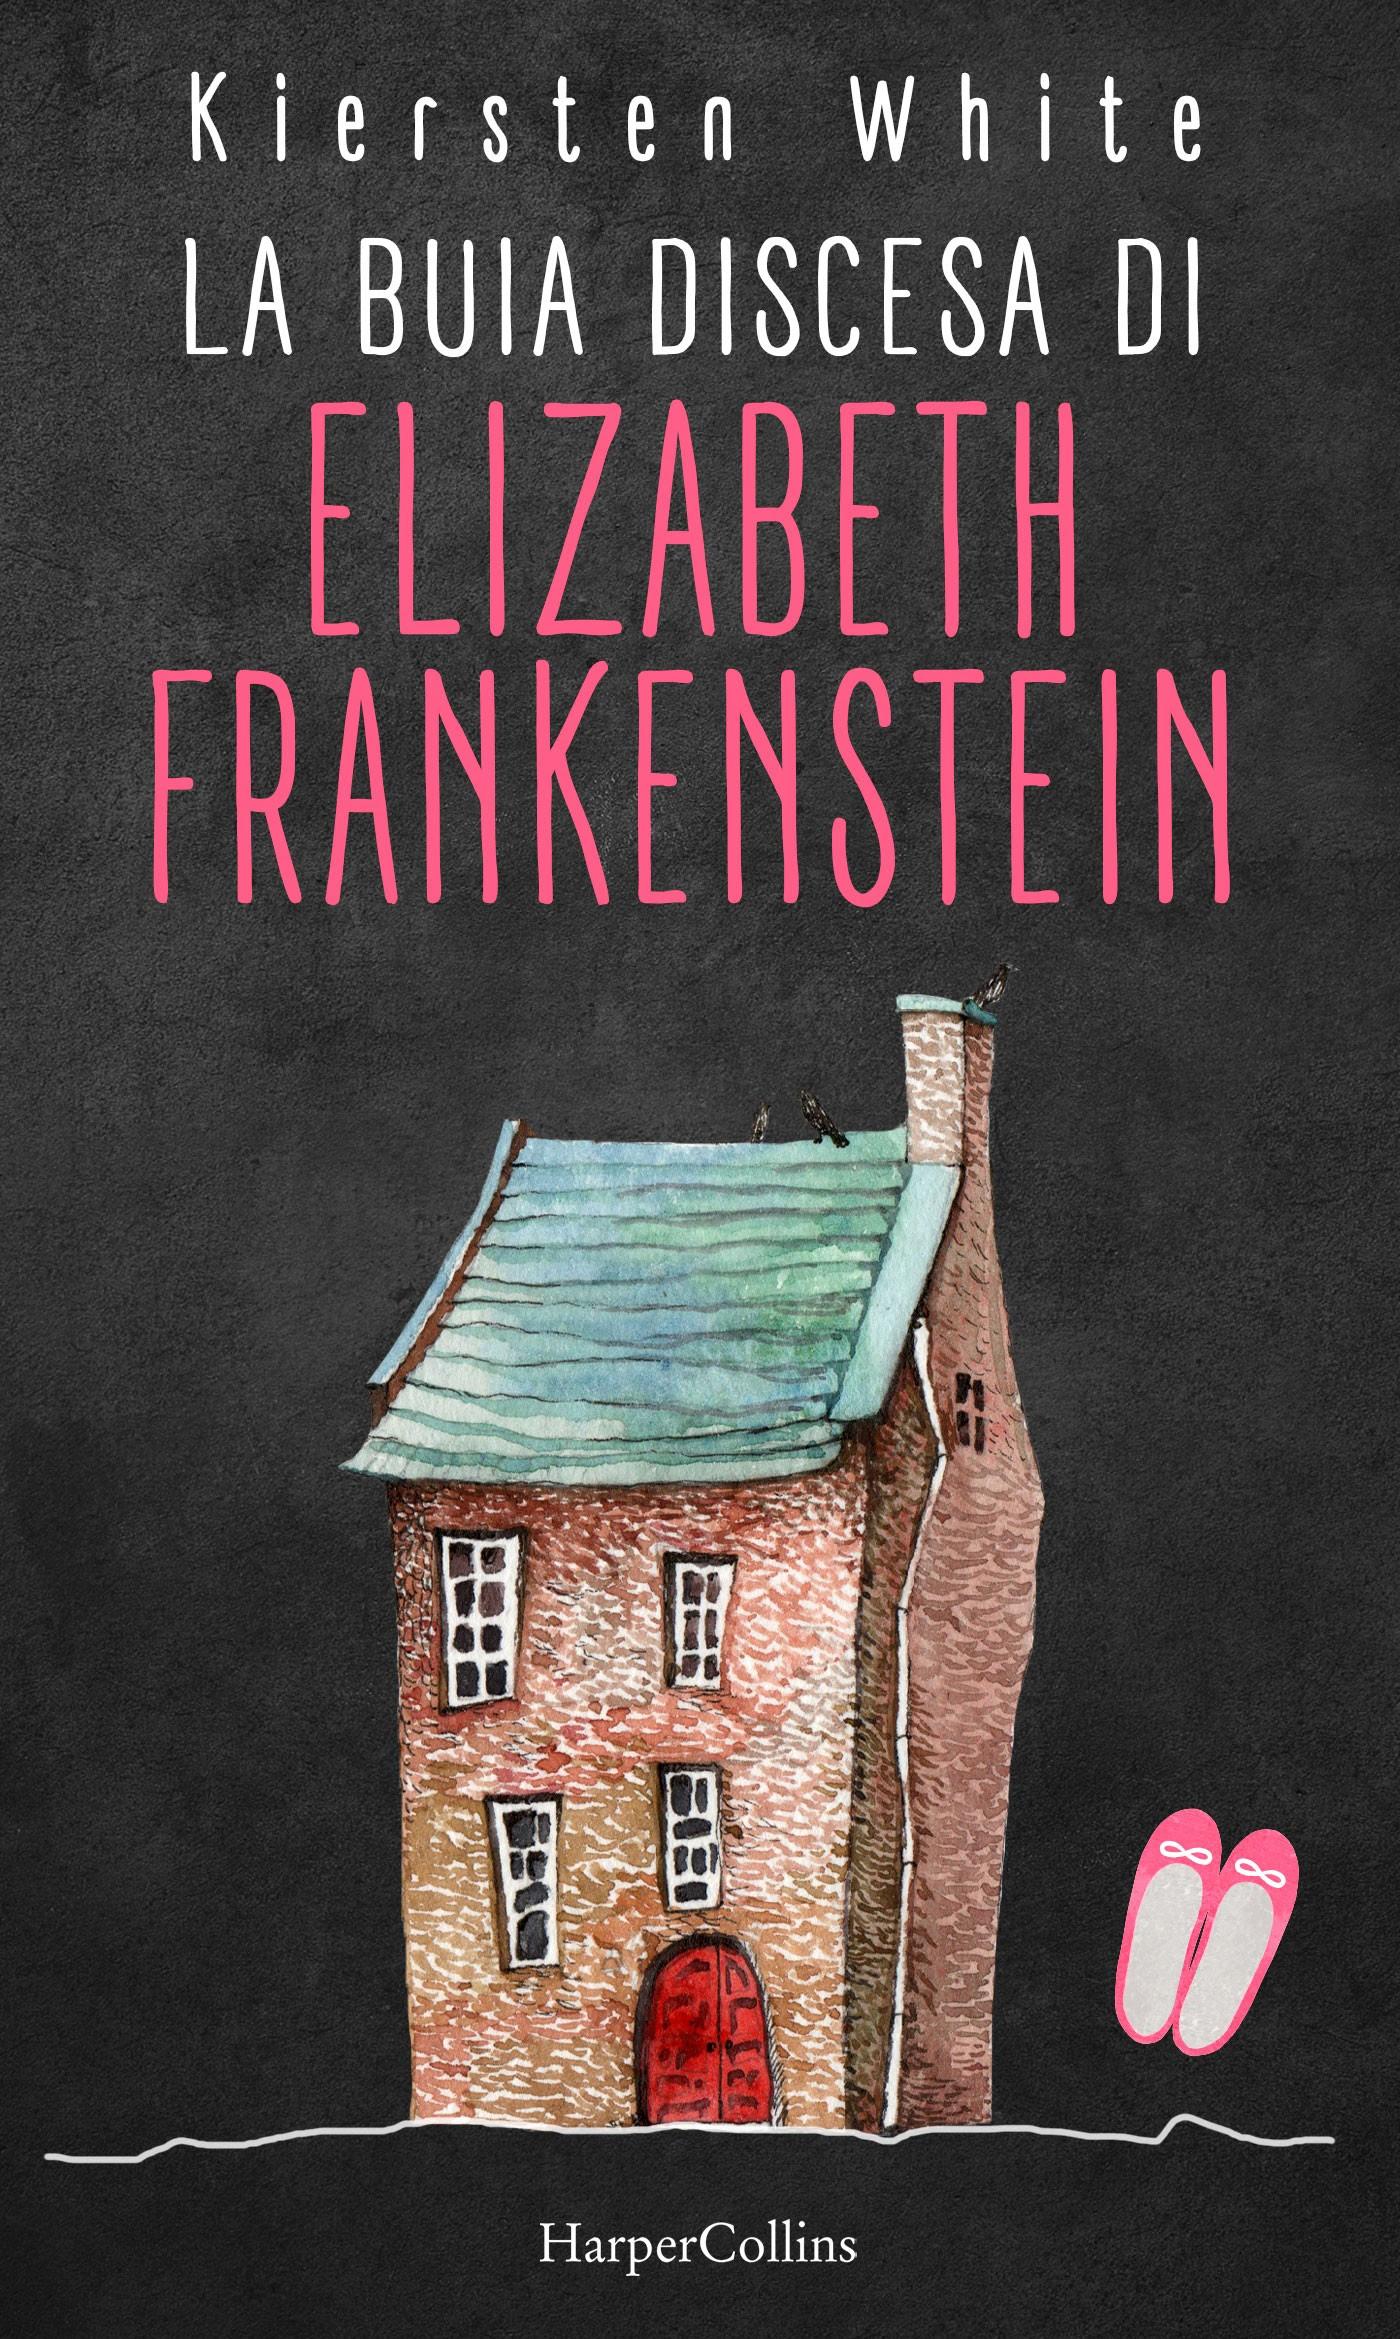 "Risultati immagini per La buia discesa di Elizabeth Frankenstein"" di Kiersten White"